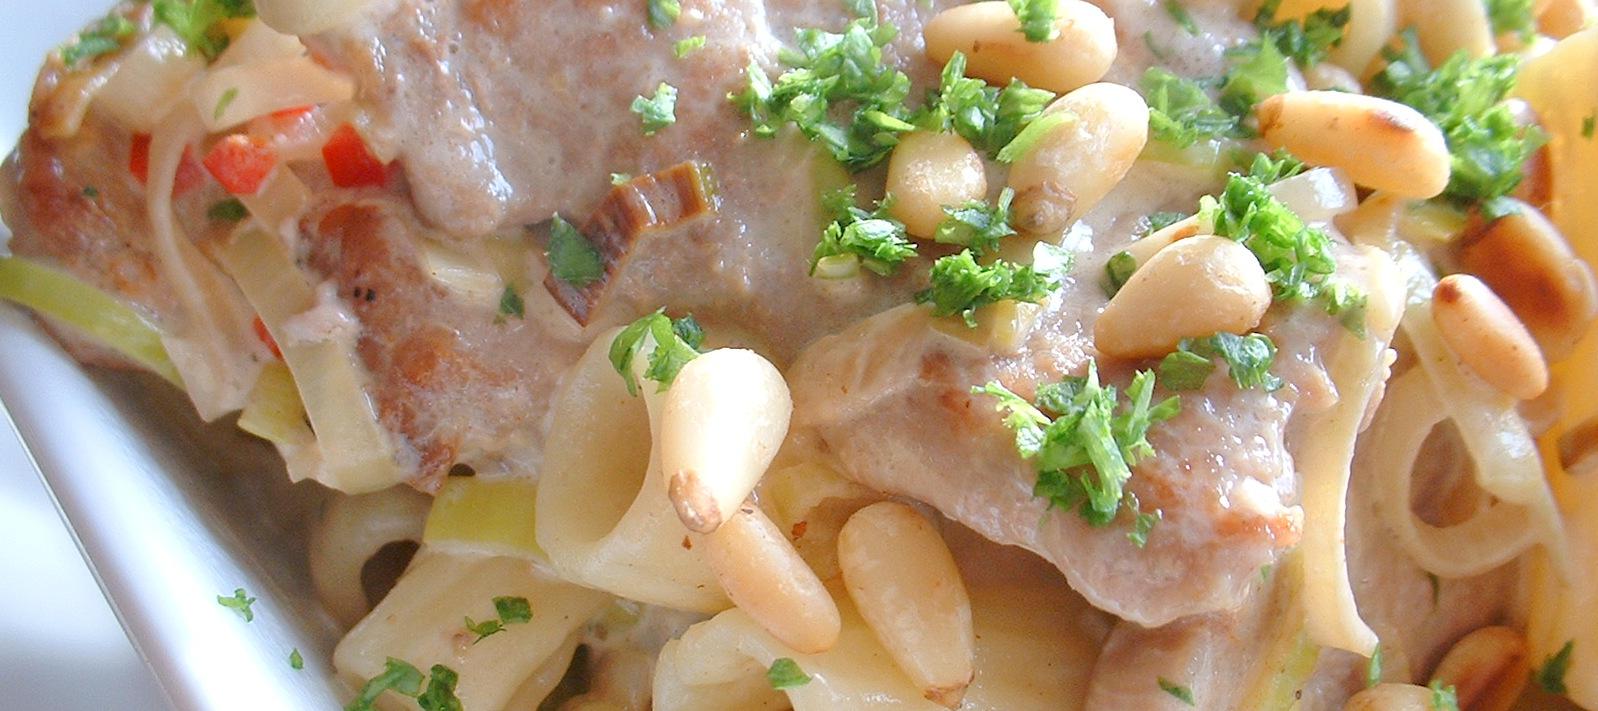 Pasta With Pork Recipe Pasta With Pork Pork Recipes